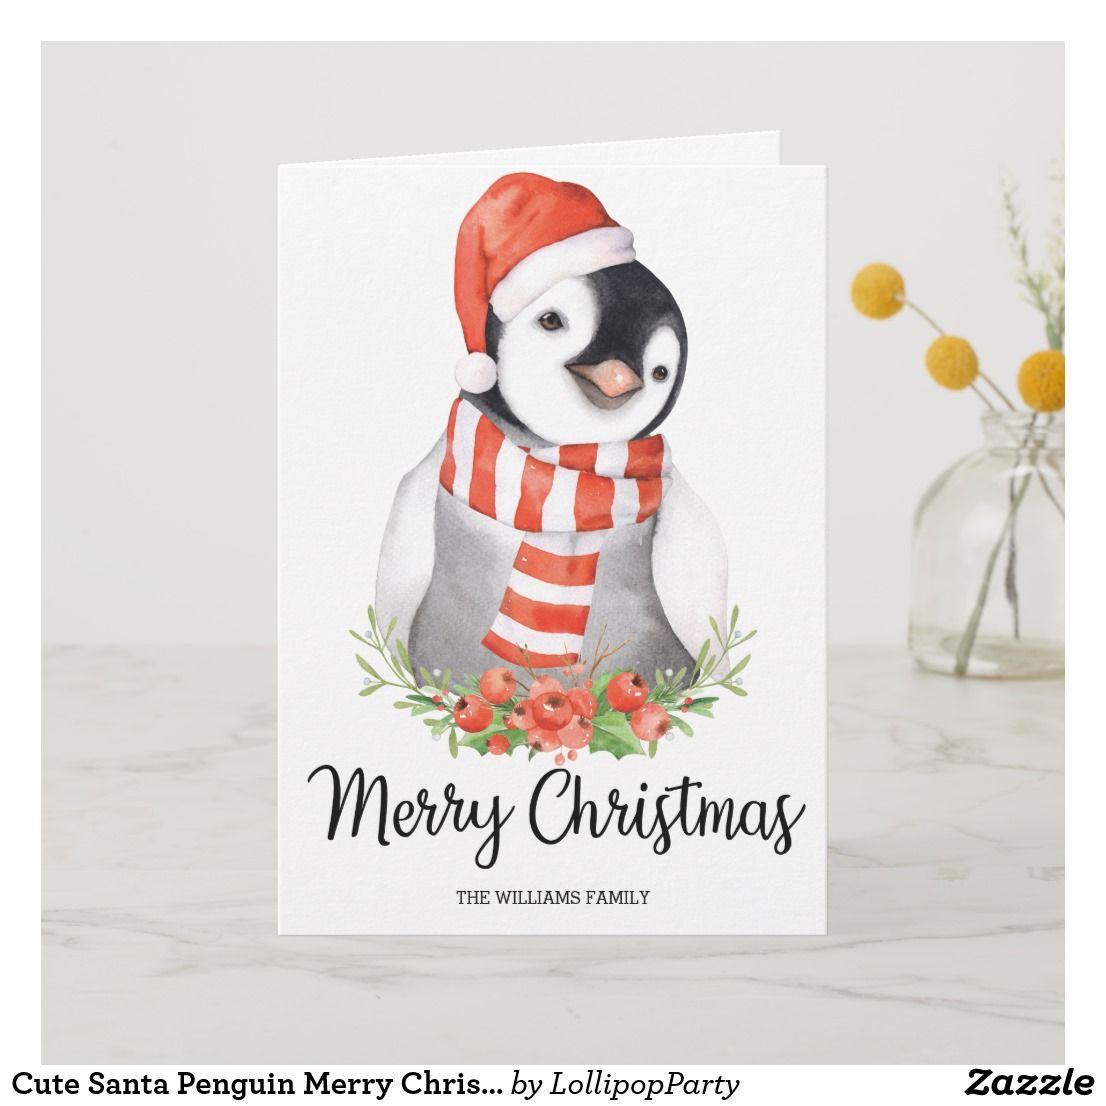 Cute santa penguin merry christmas greetings holiday card